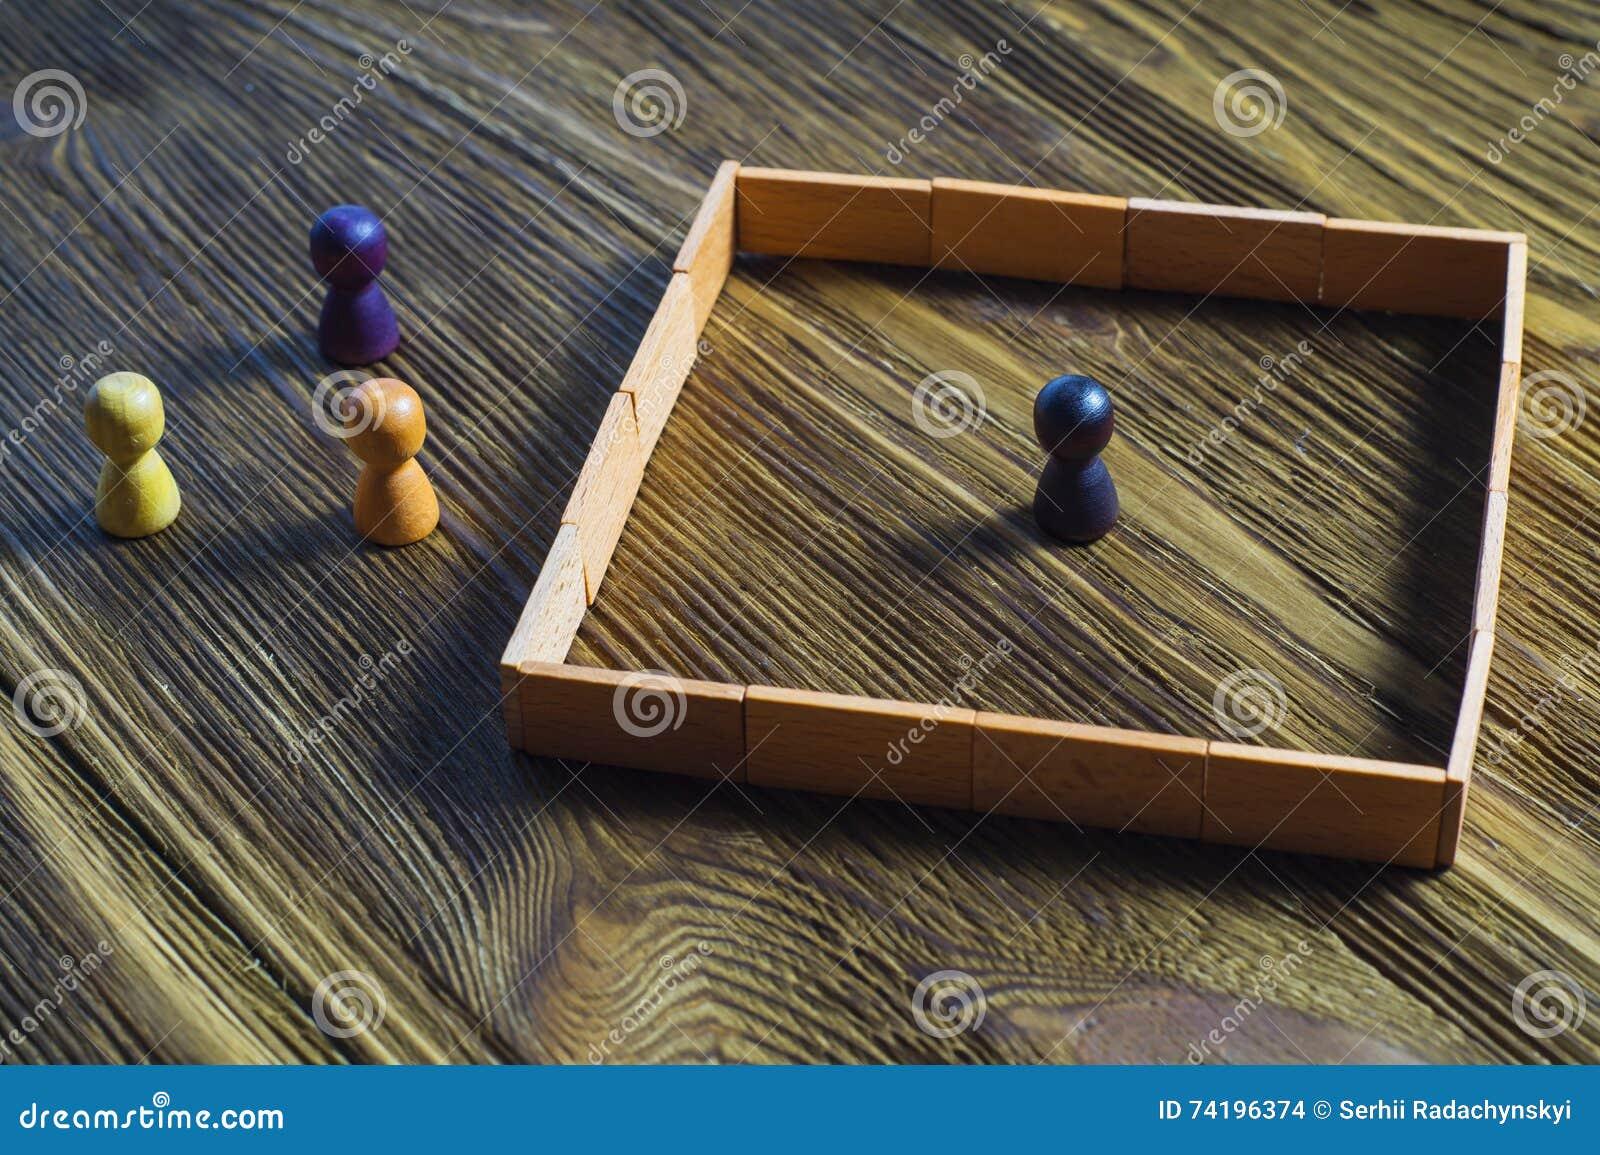 Misunderstanding, a barrier in relations, denial of society.